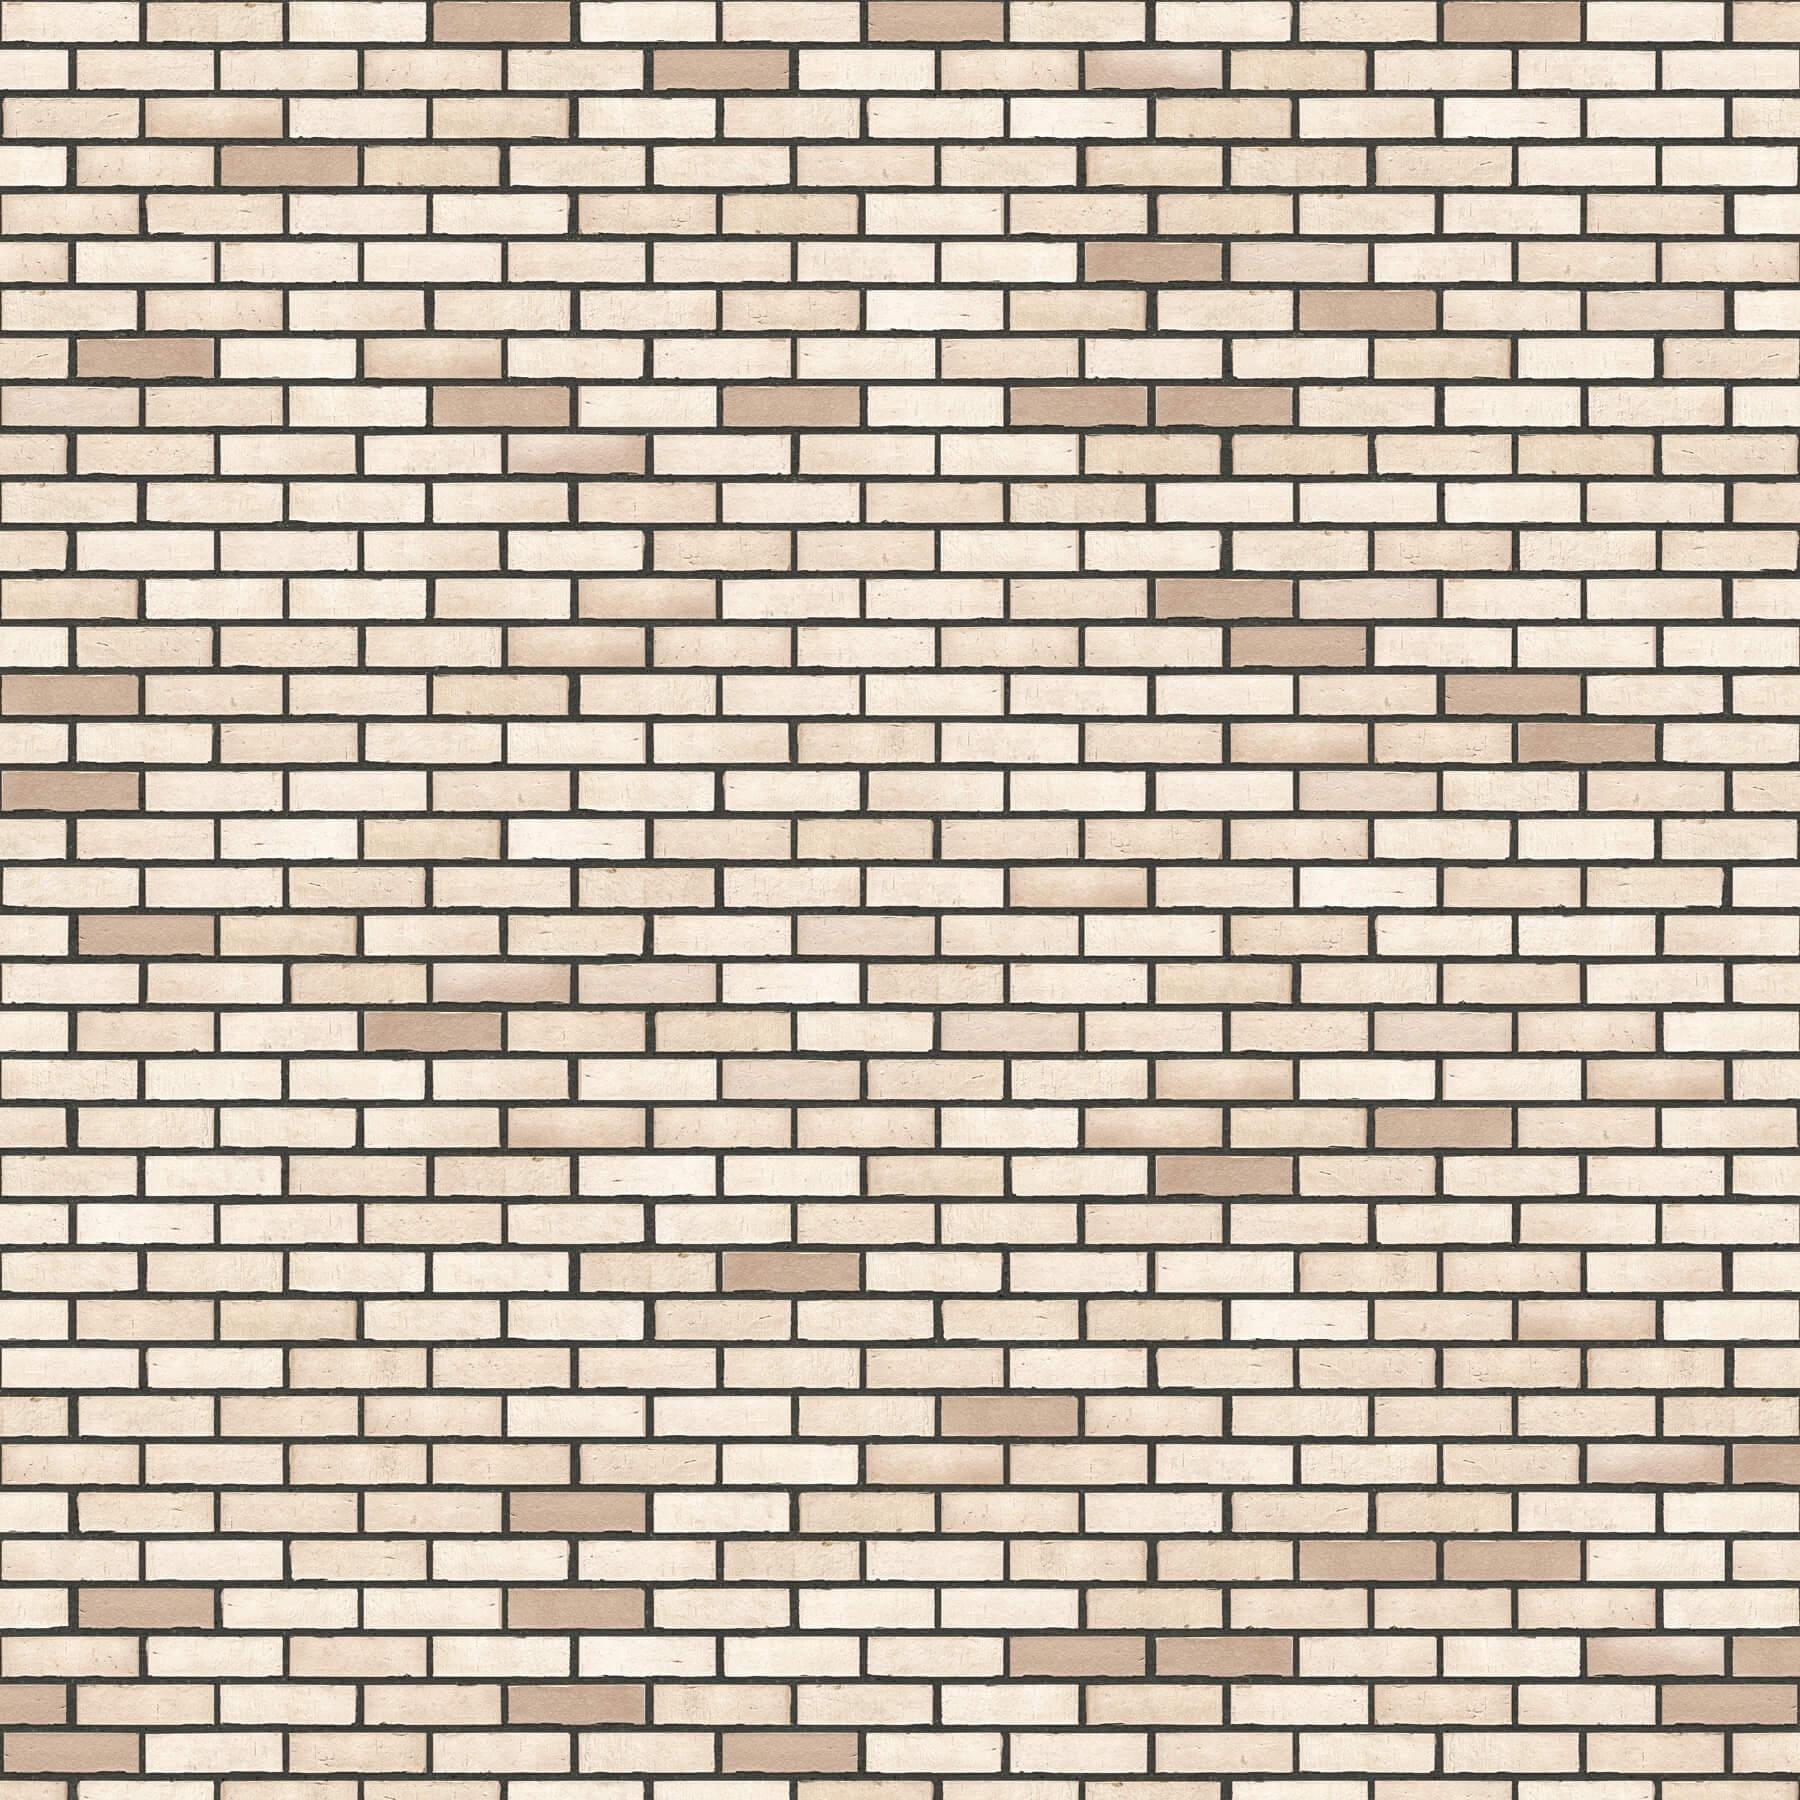 Puna-cigla-FeldHaus-Klinker-brick-house-beograd-nf-k-941-Antracit Fua